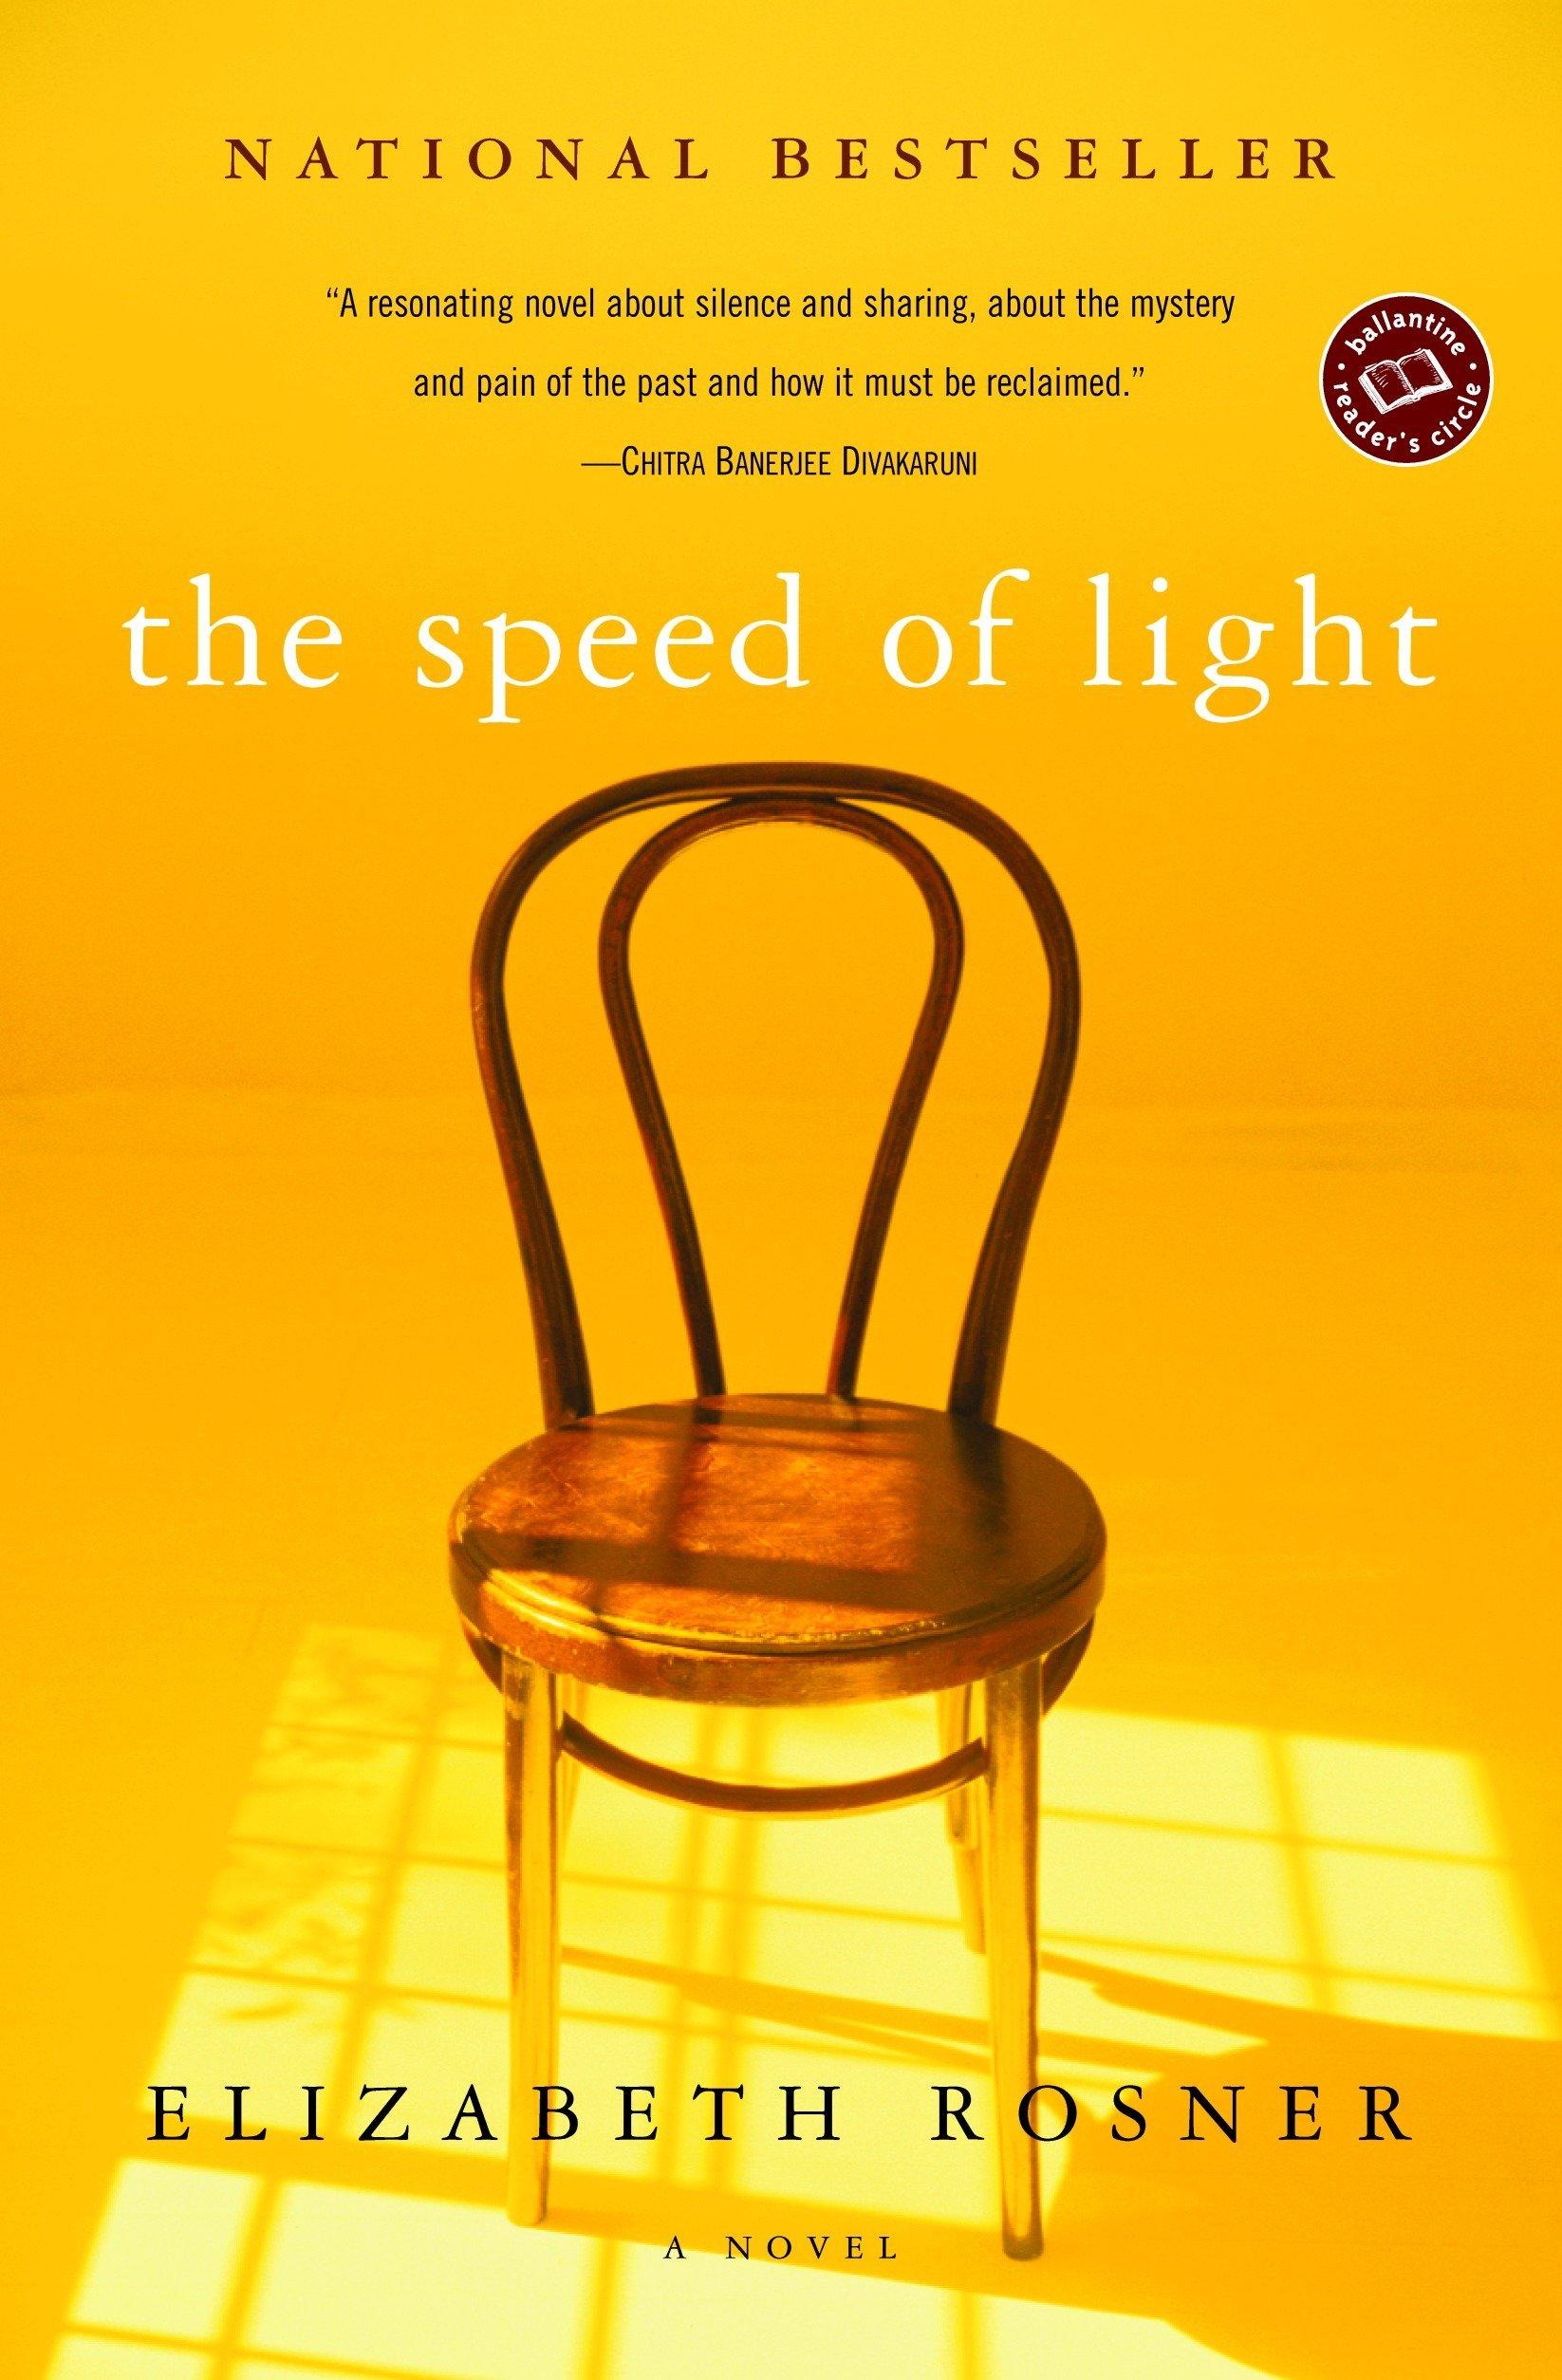 The Speed of Light: A Novel (Ballantine Reader's Circle): Elizabeth Rosner:  9780345442253: Amazon.com: Books